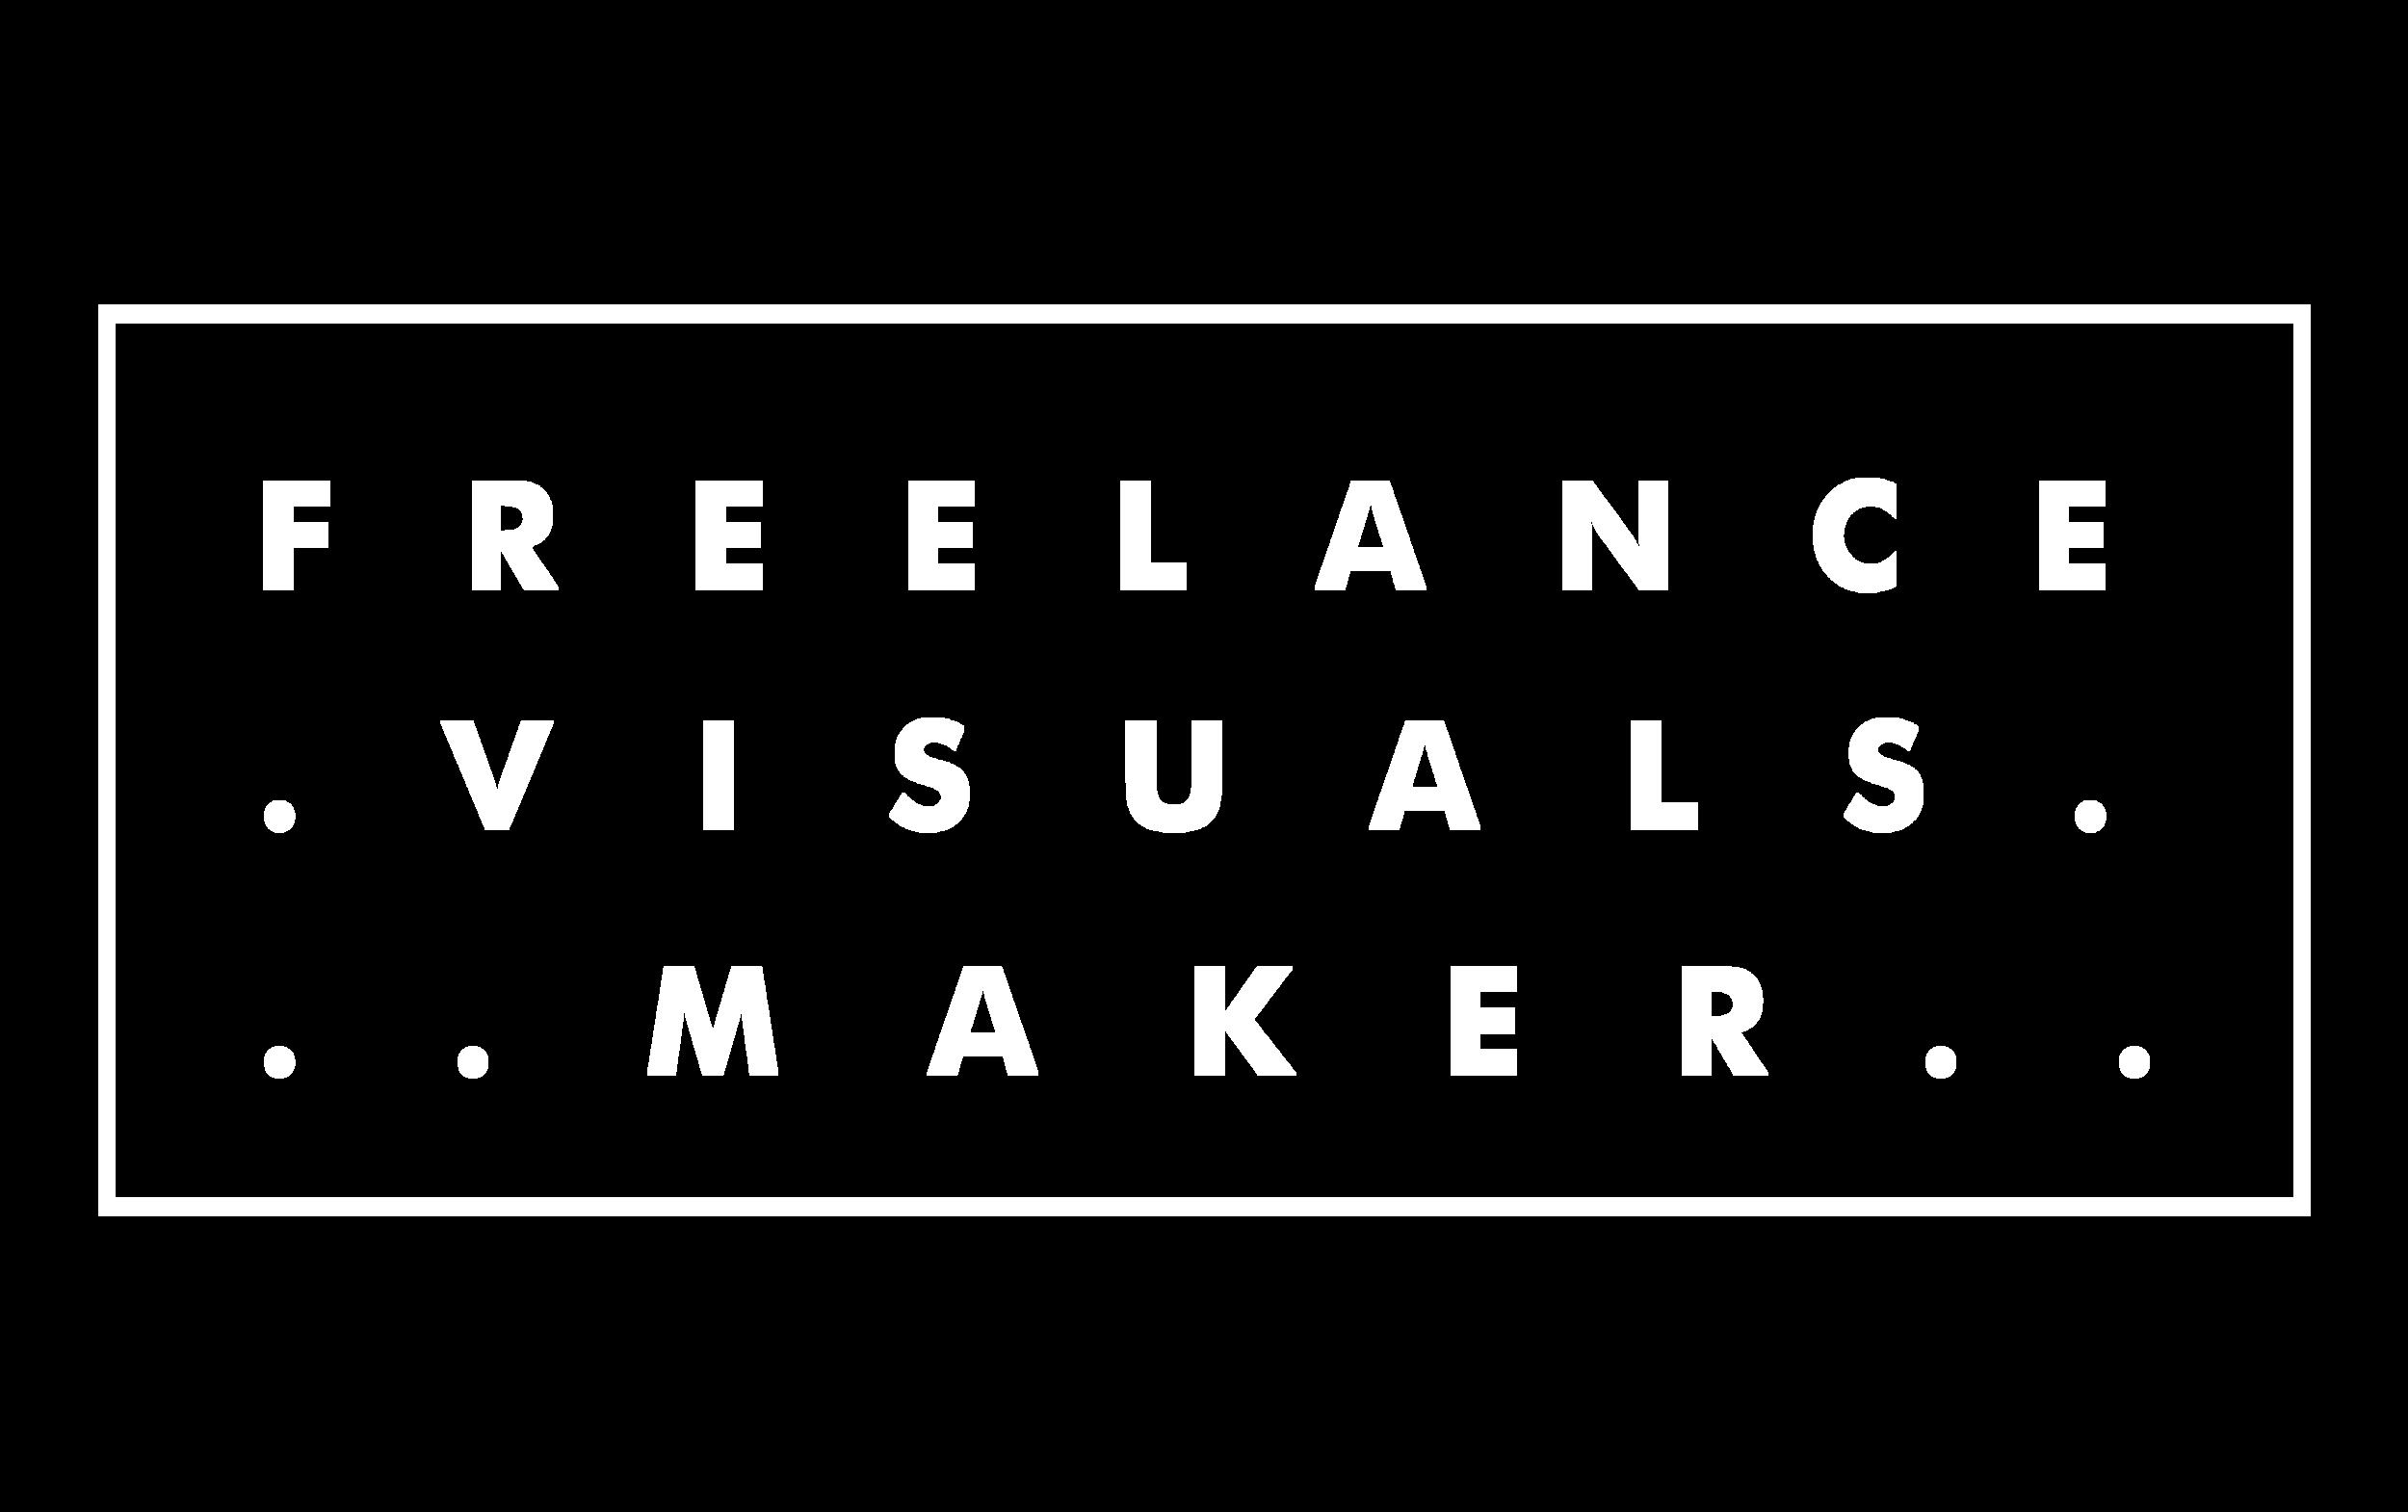 freelance-03-01.png